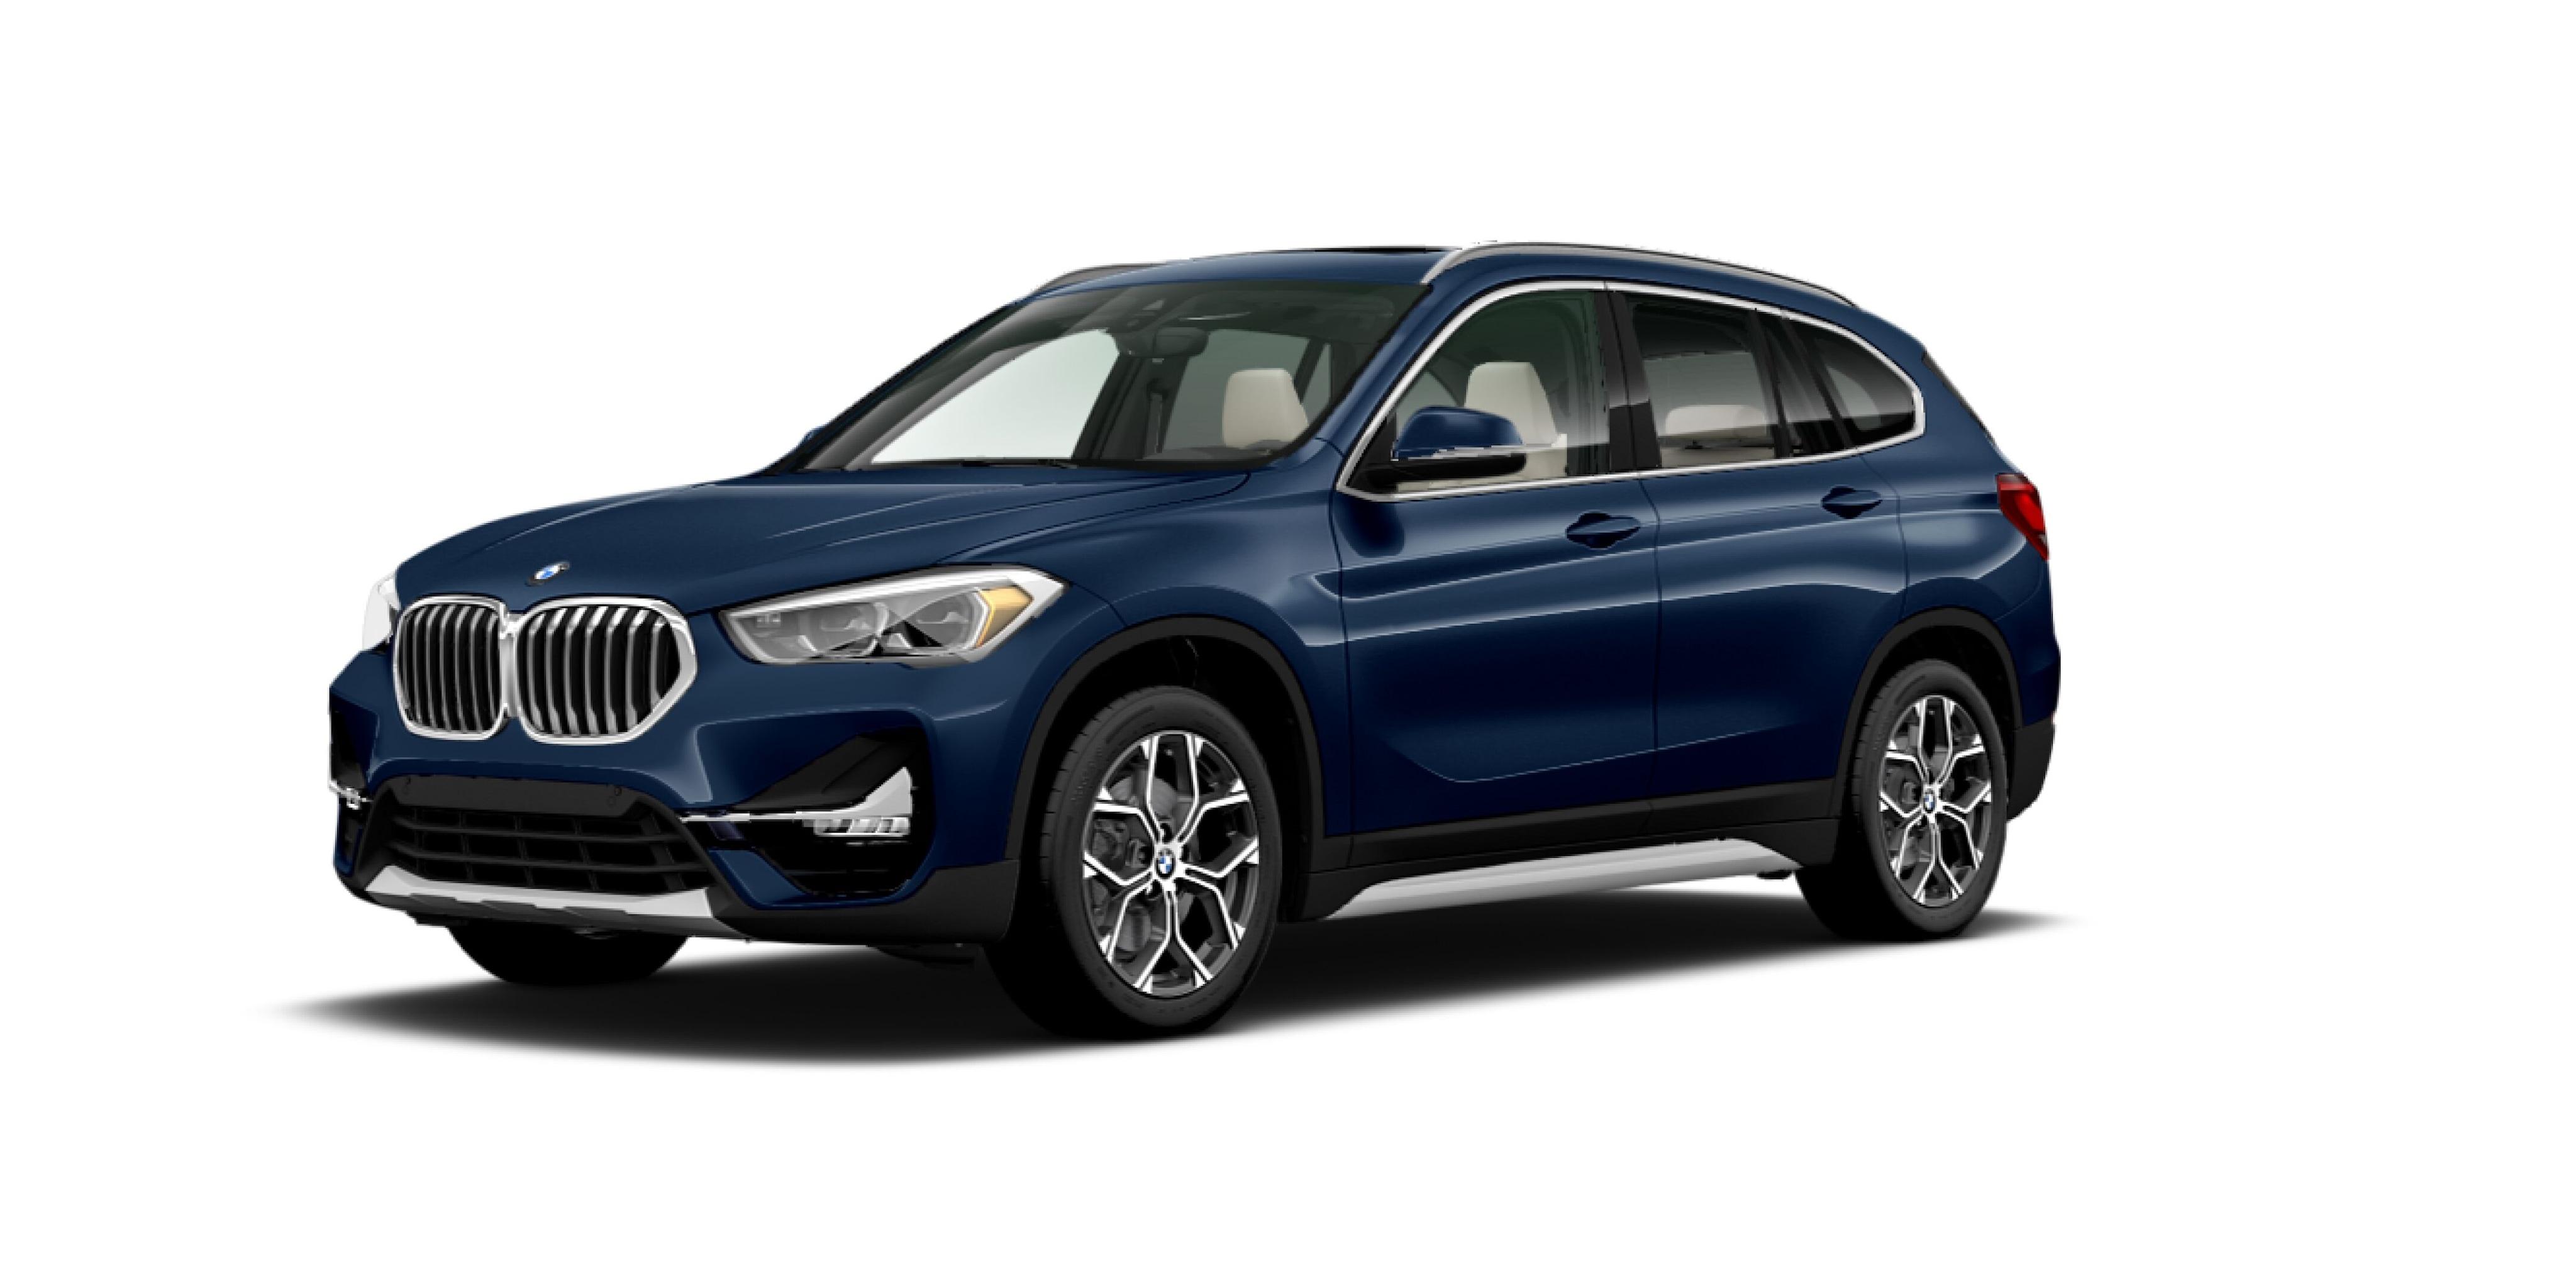 2020 BMW X1 xDrive28i SUV